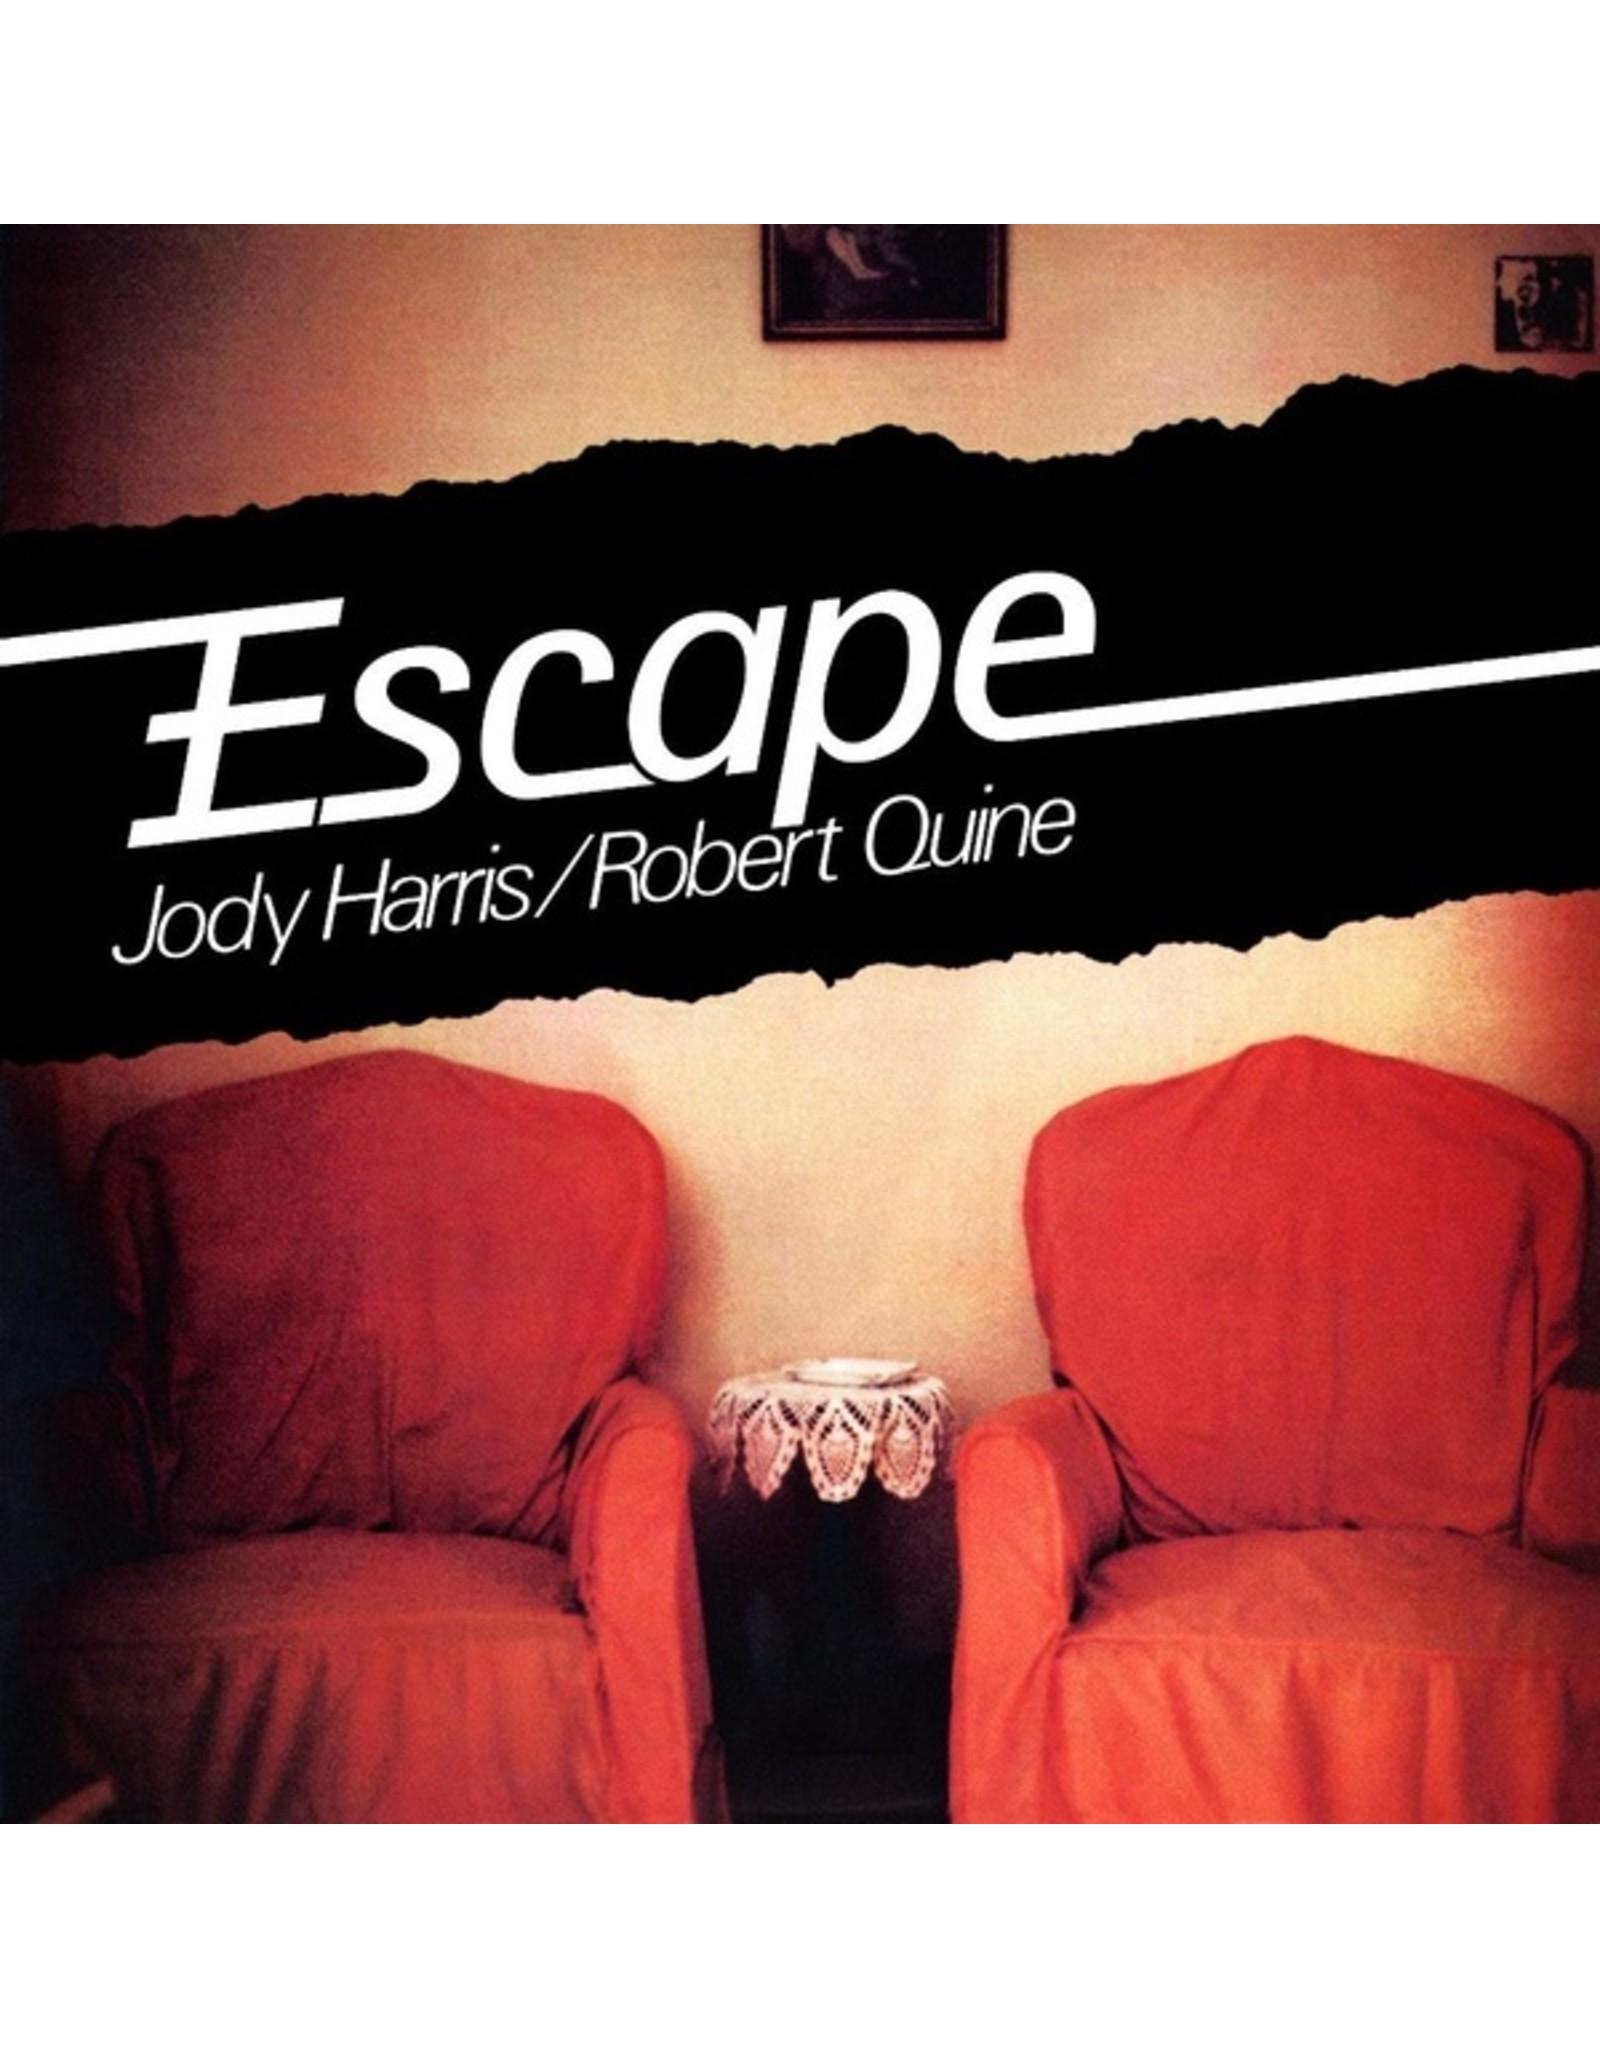 New Vinyl Jody Harris / Robert Quine - Escape LP